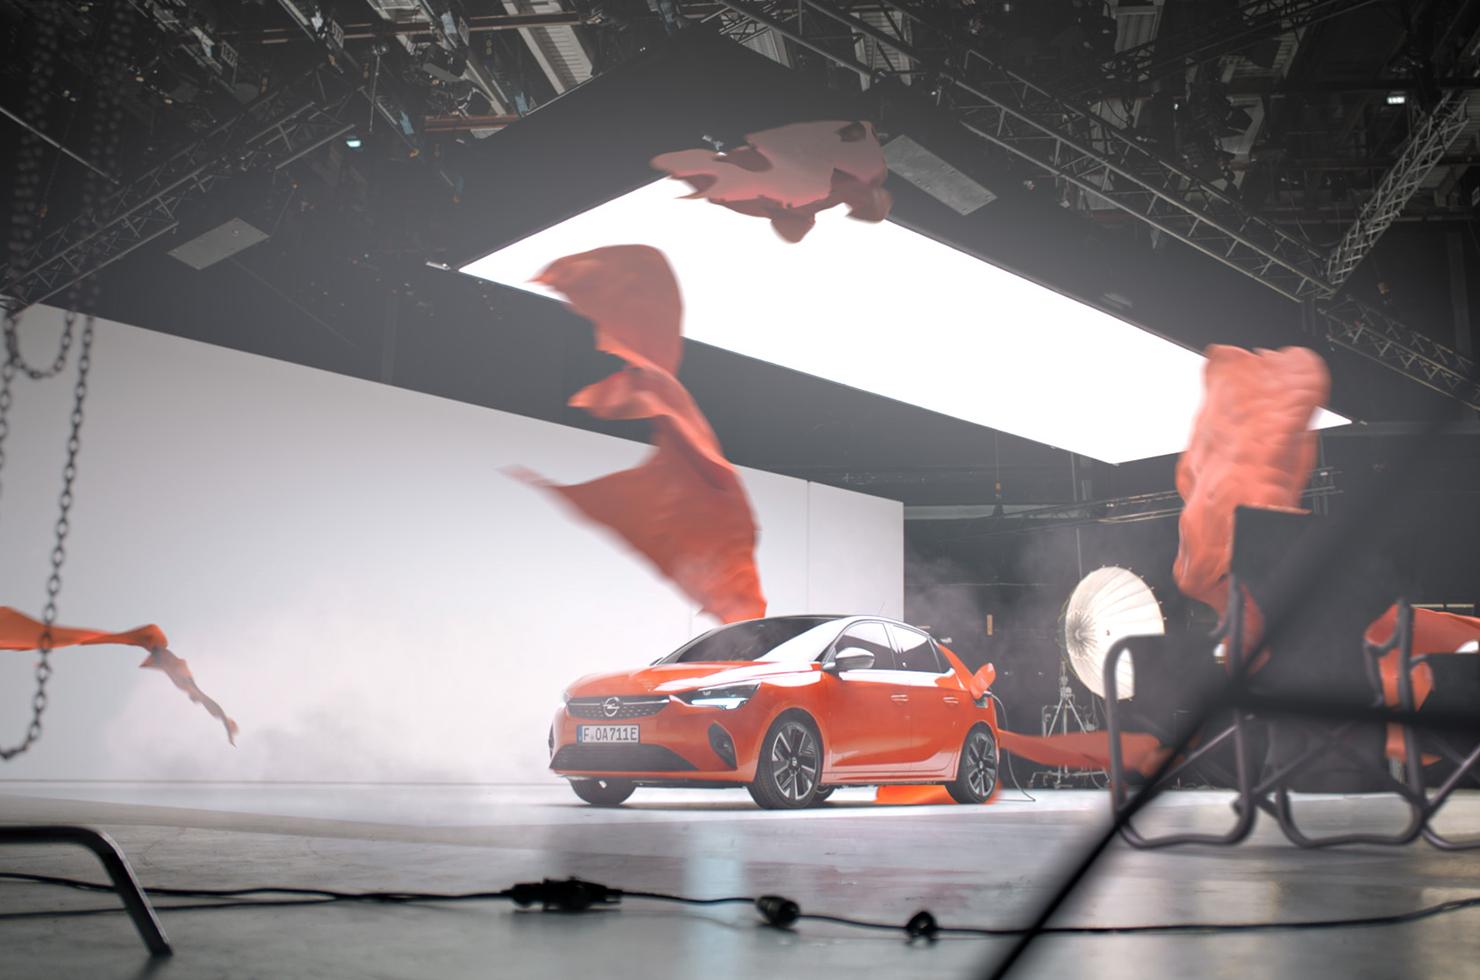 """Break the Bubble"" VELOCITY McCANN und MRM//McCANN starten Kommunikationsoffensive für den Opel Corsa-e"